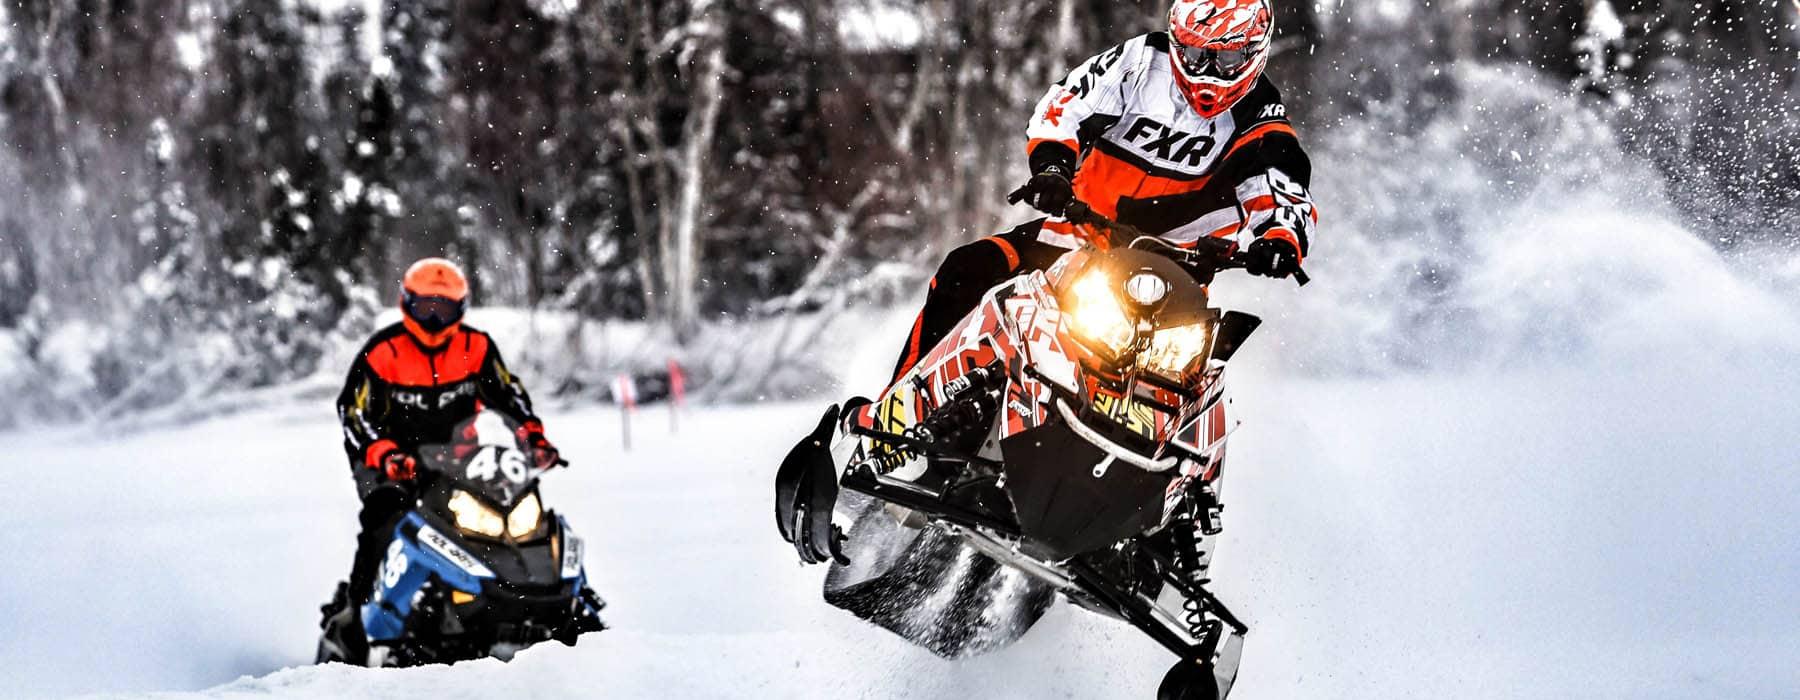 AMMC-Racing-Snowmchine-Racing-by-Jesse-Fliris